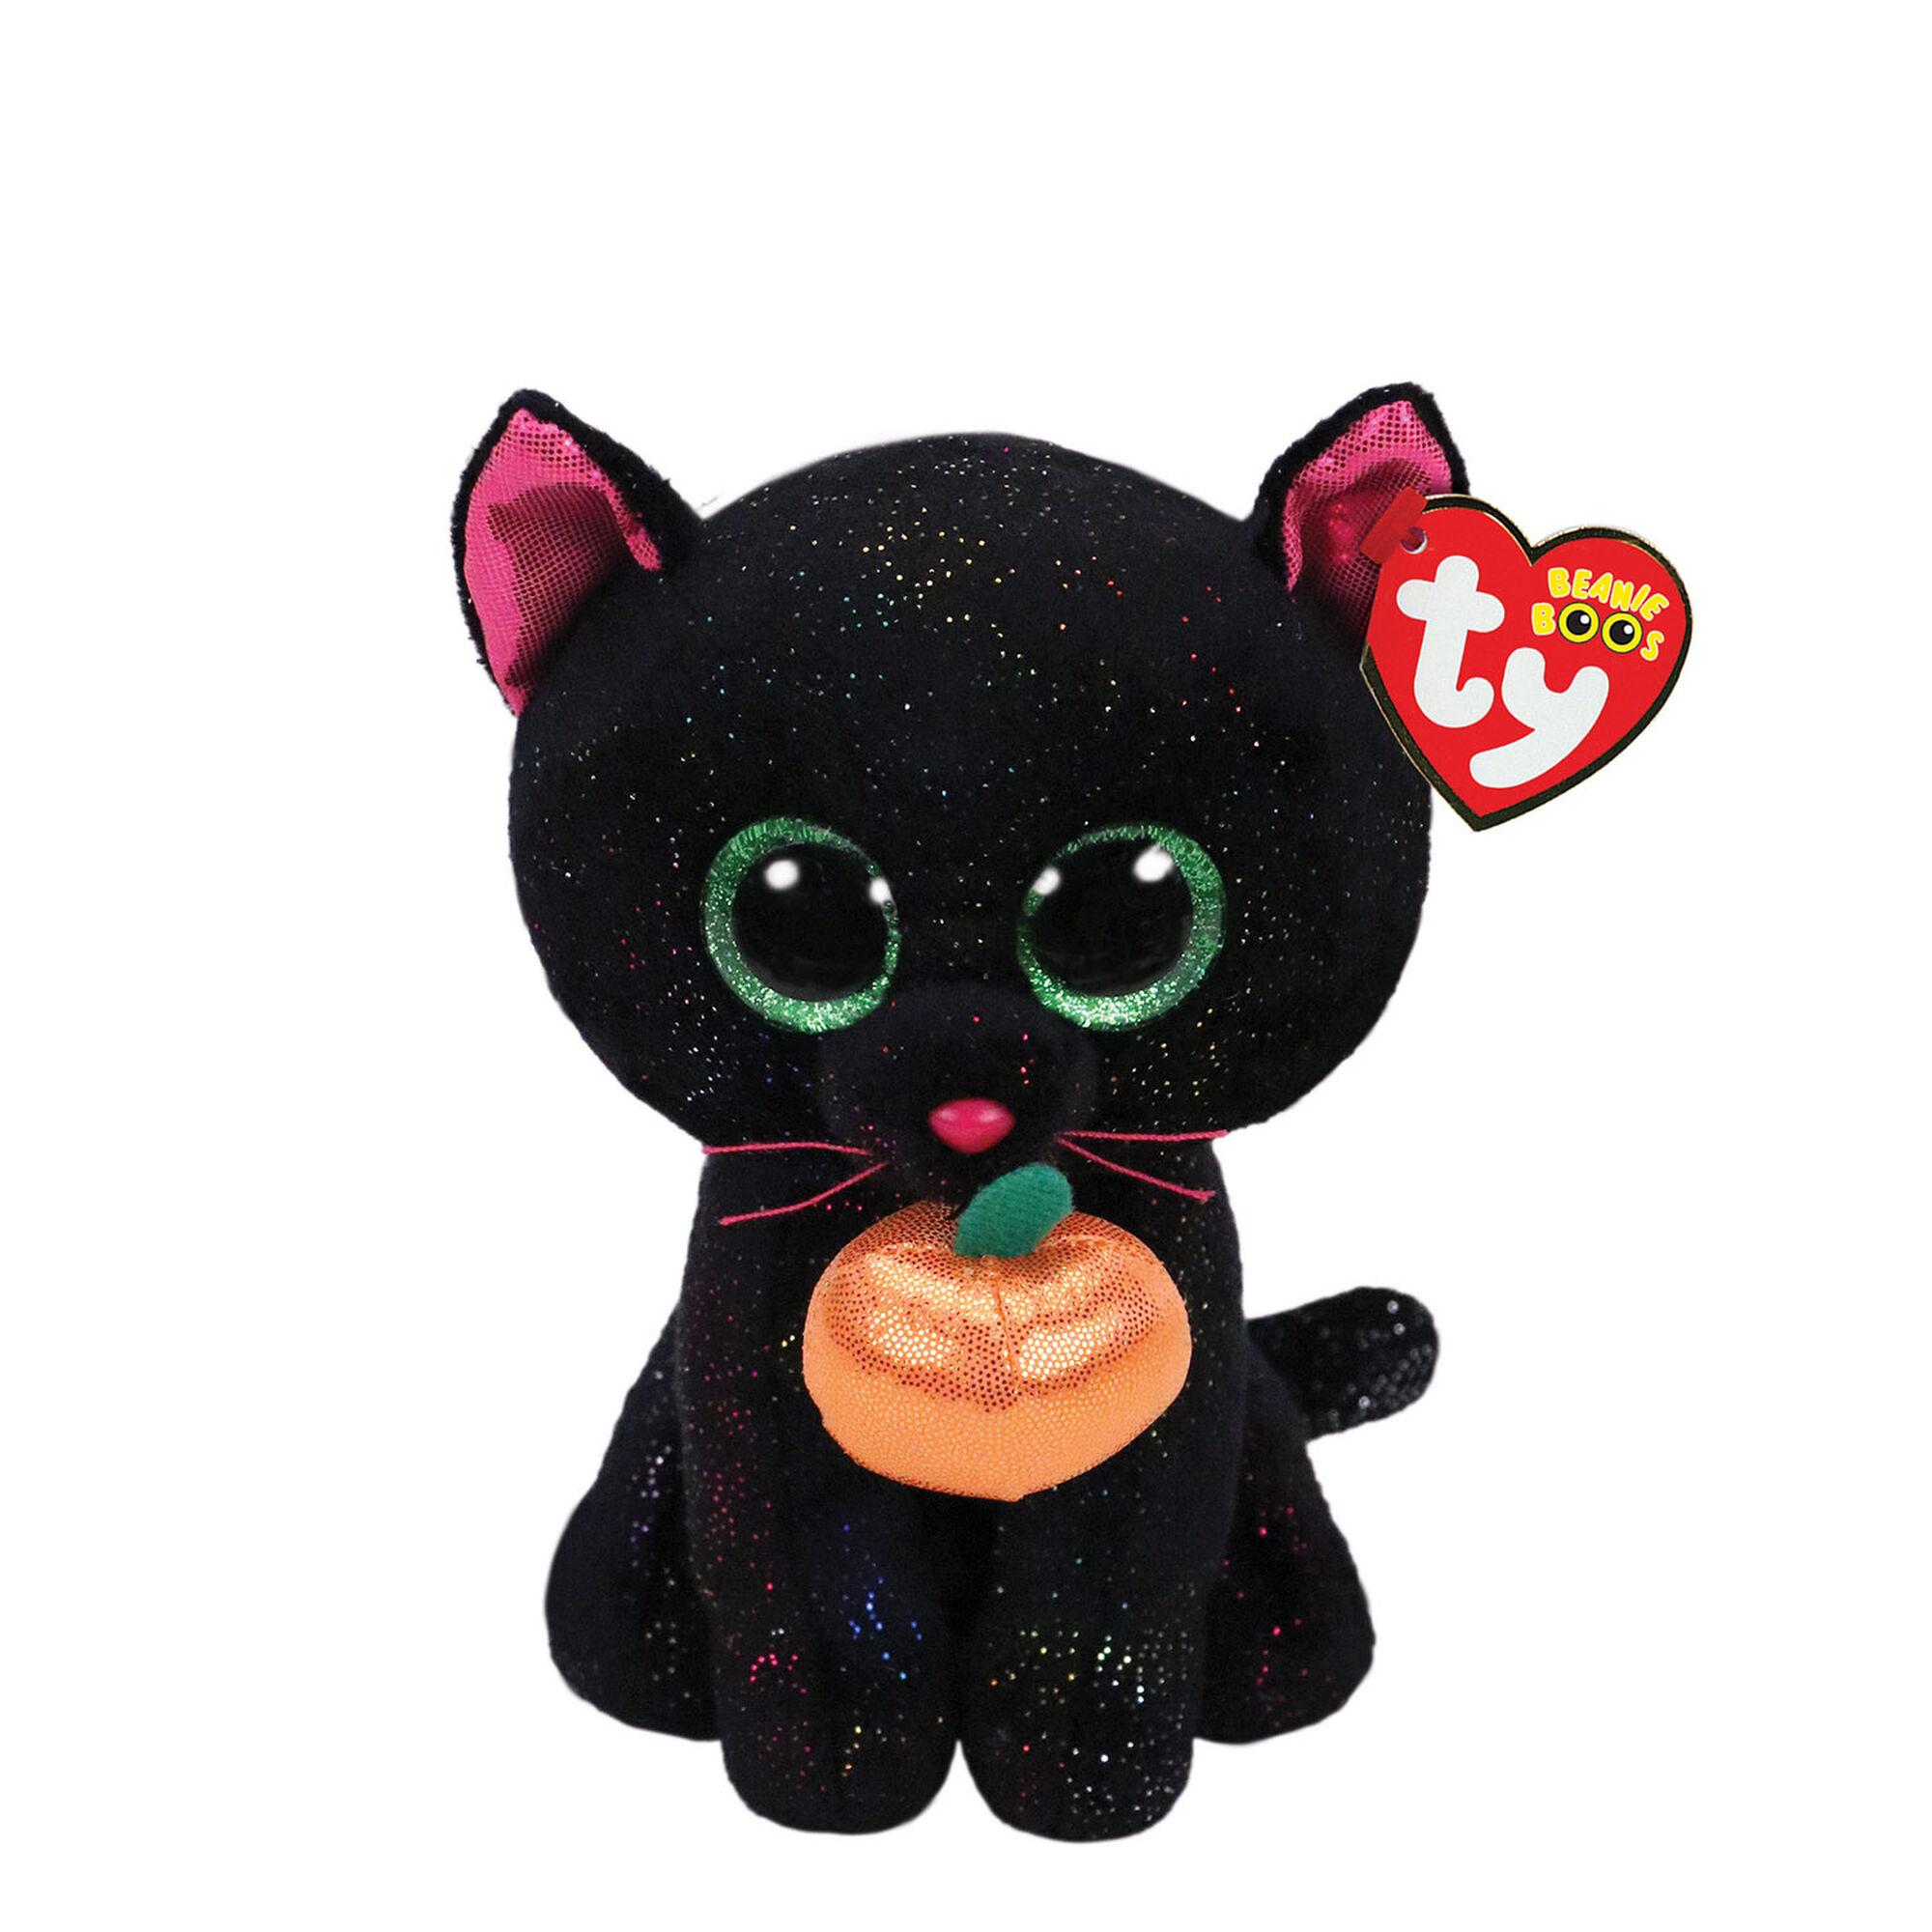 ... Ty Beanie Boo Small Potion the Cat Soft Toy 5e2adbf6e8e5